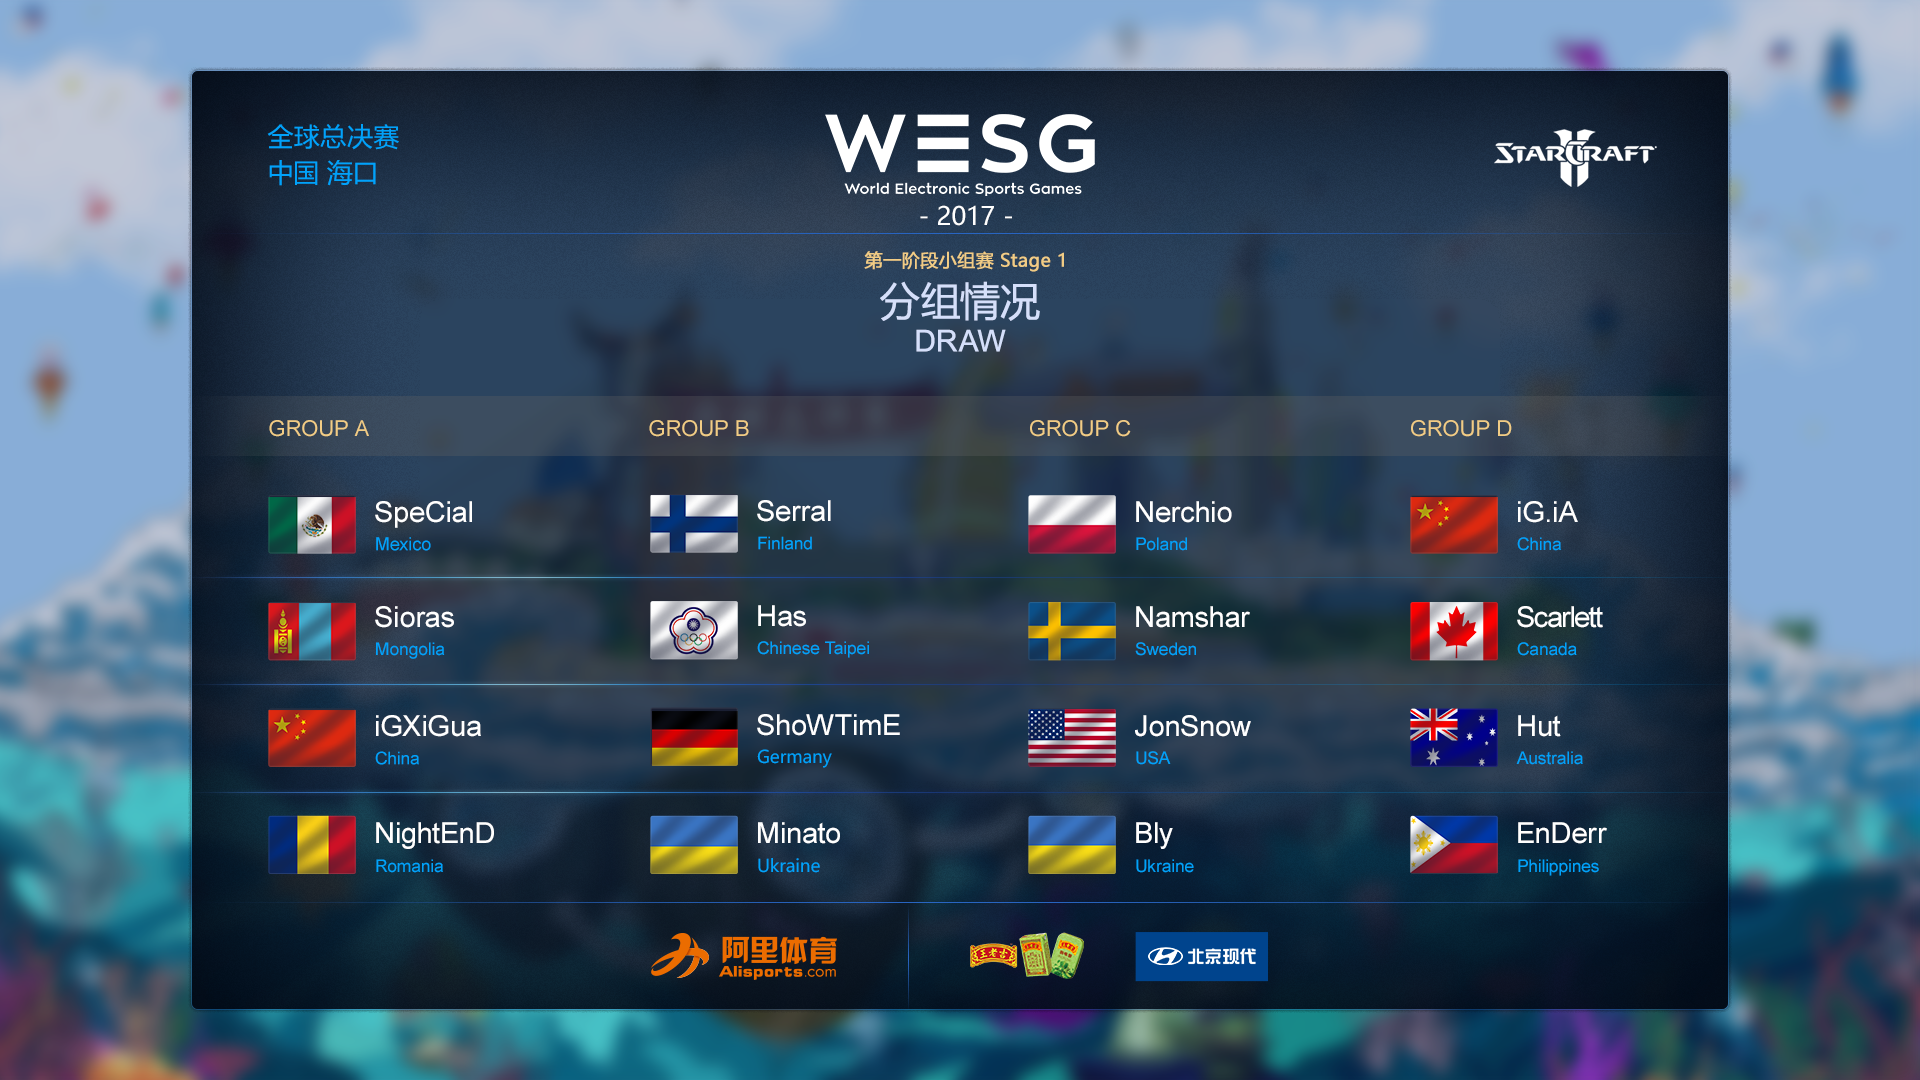 WESG2017总决赛13日打响 星际2项目分组赛程公布